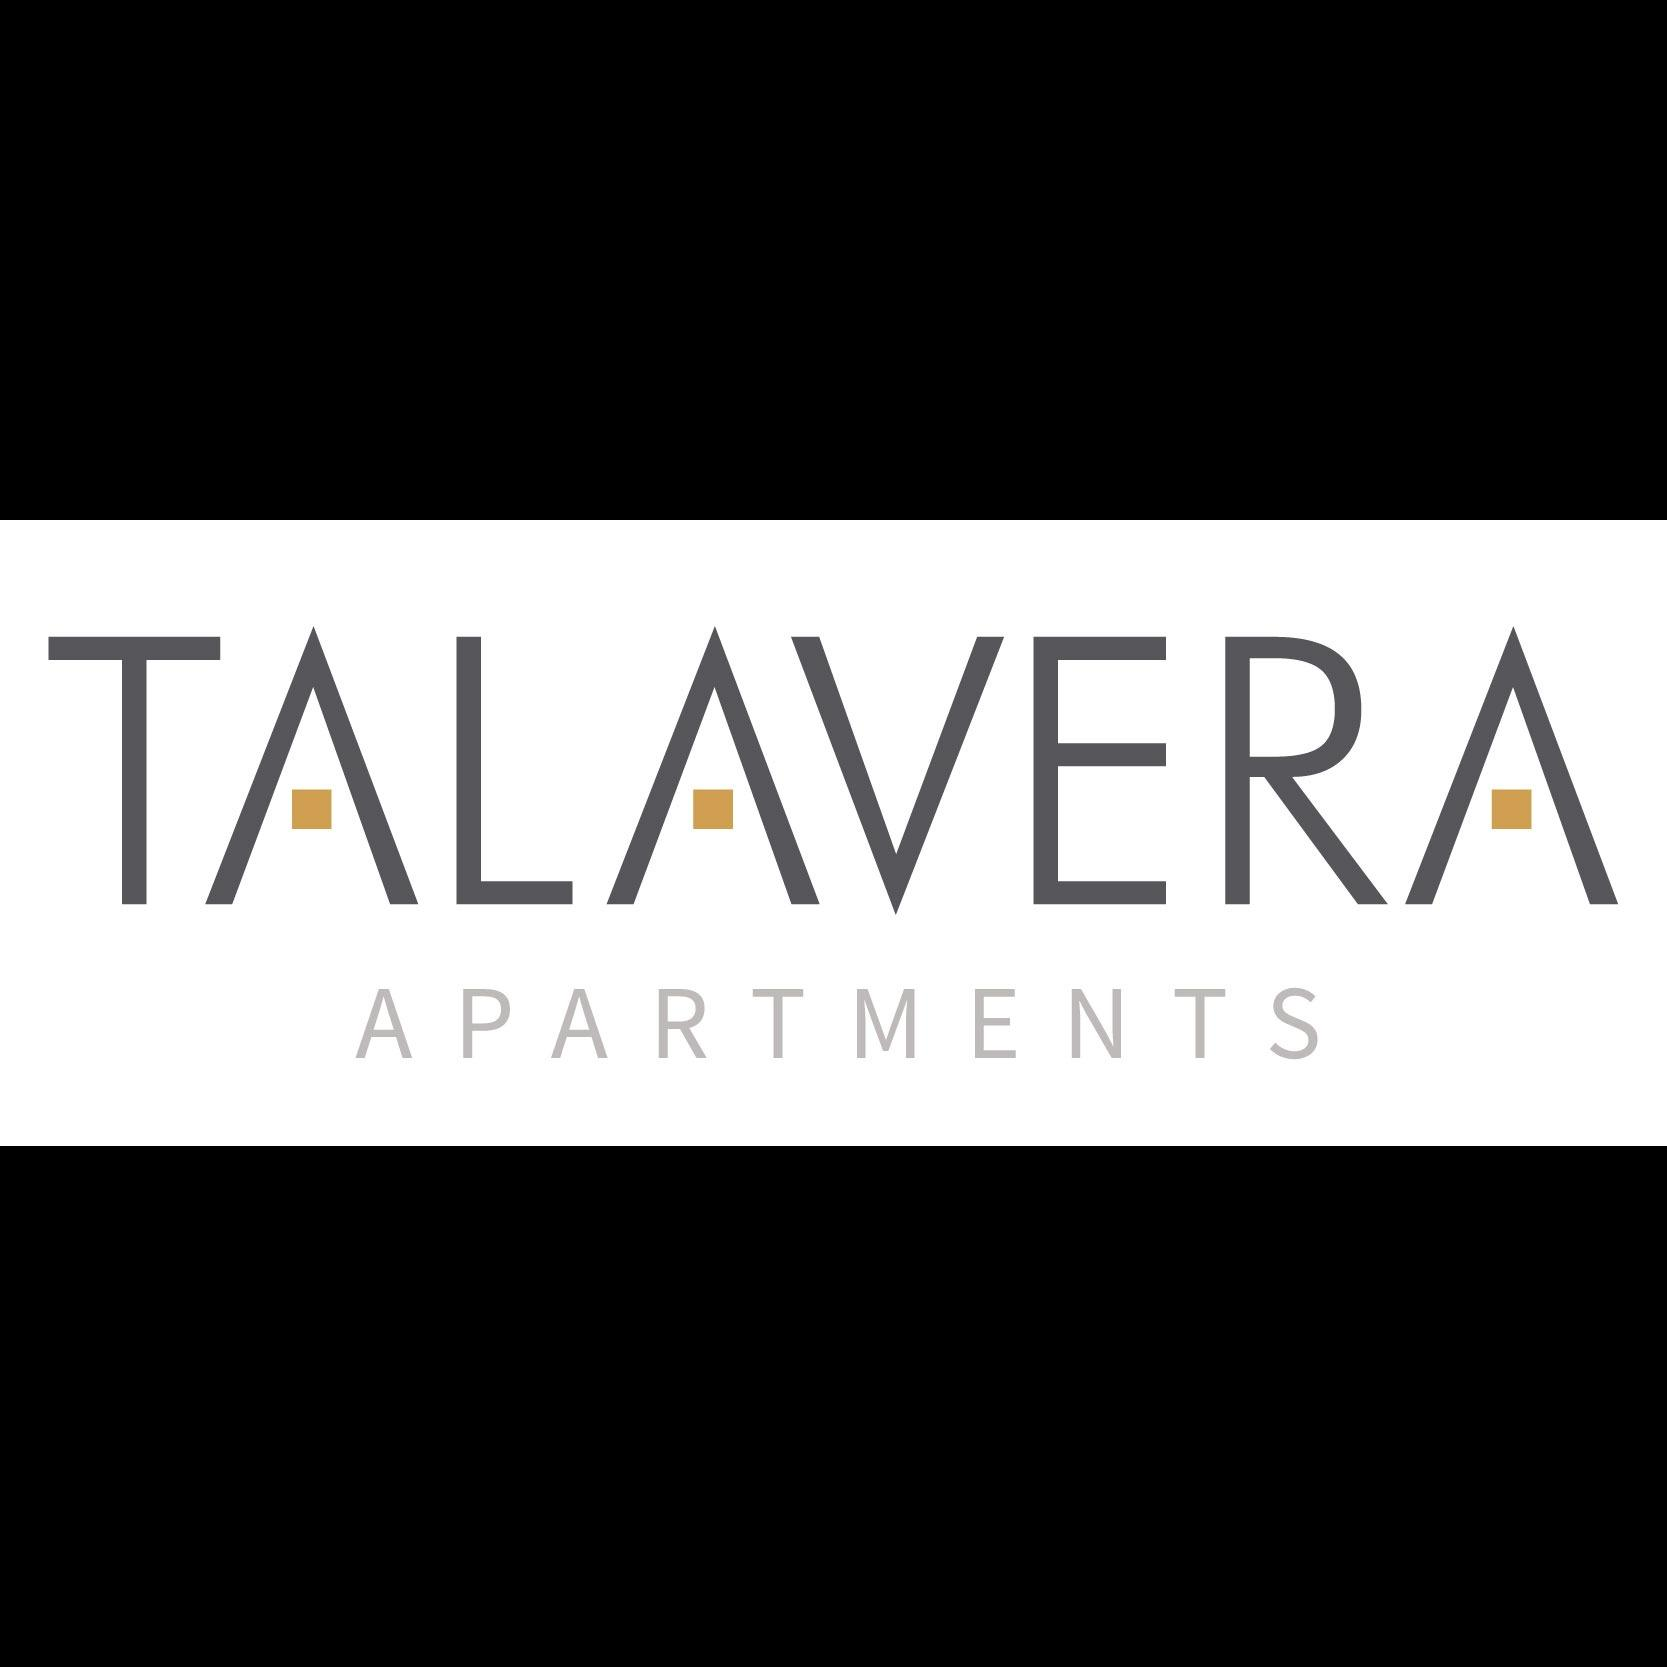 Talavera Apartments